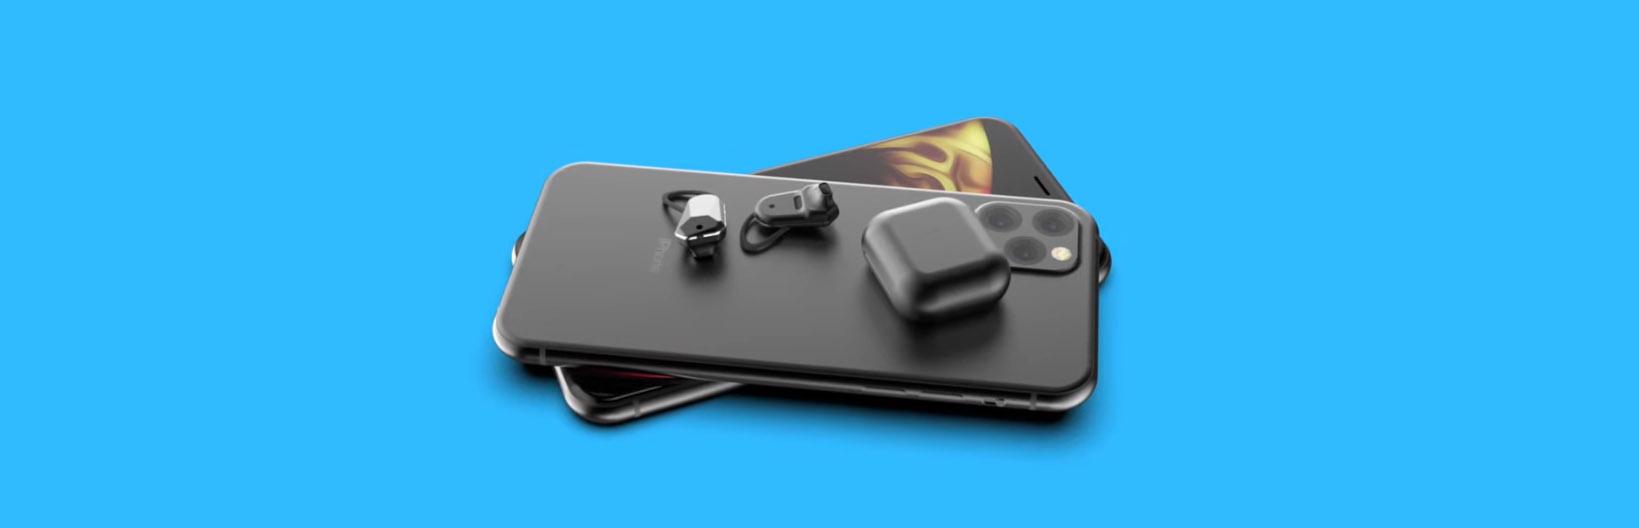 iPhone XE — Реверсивная зарядка